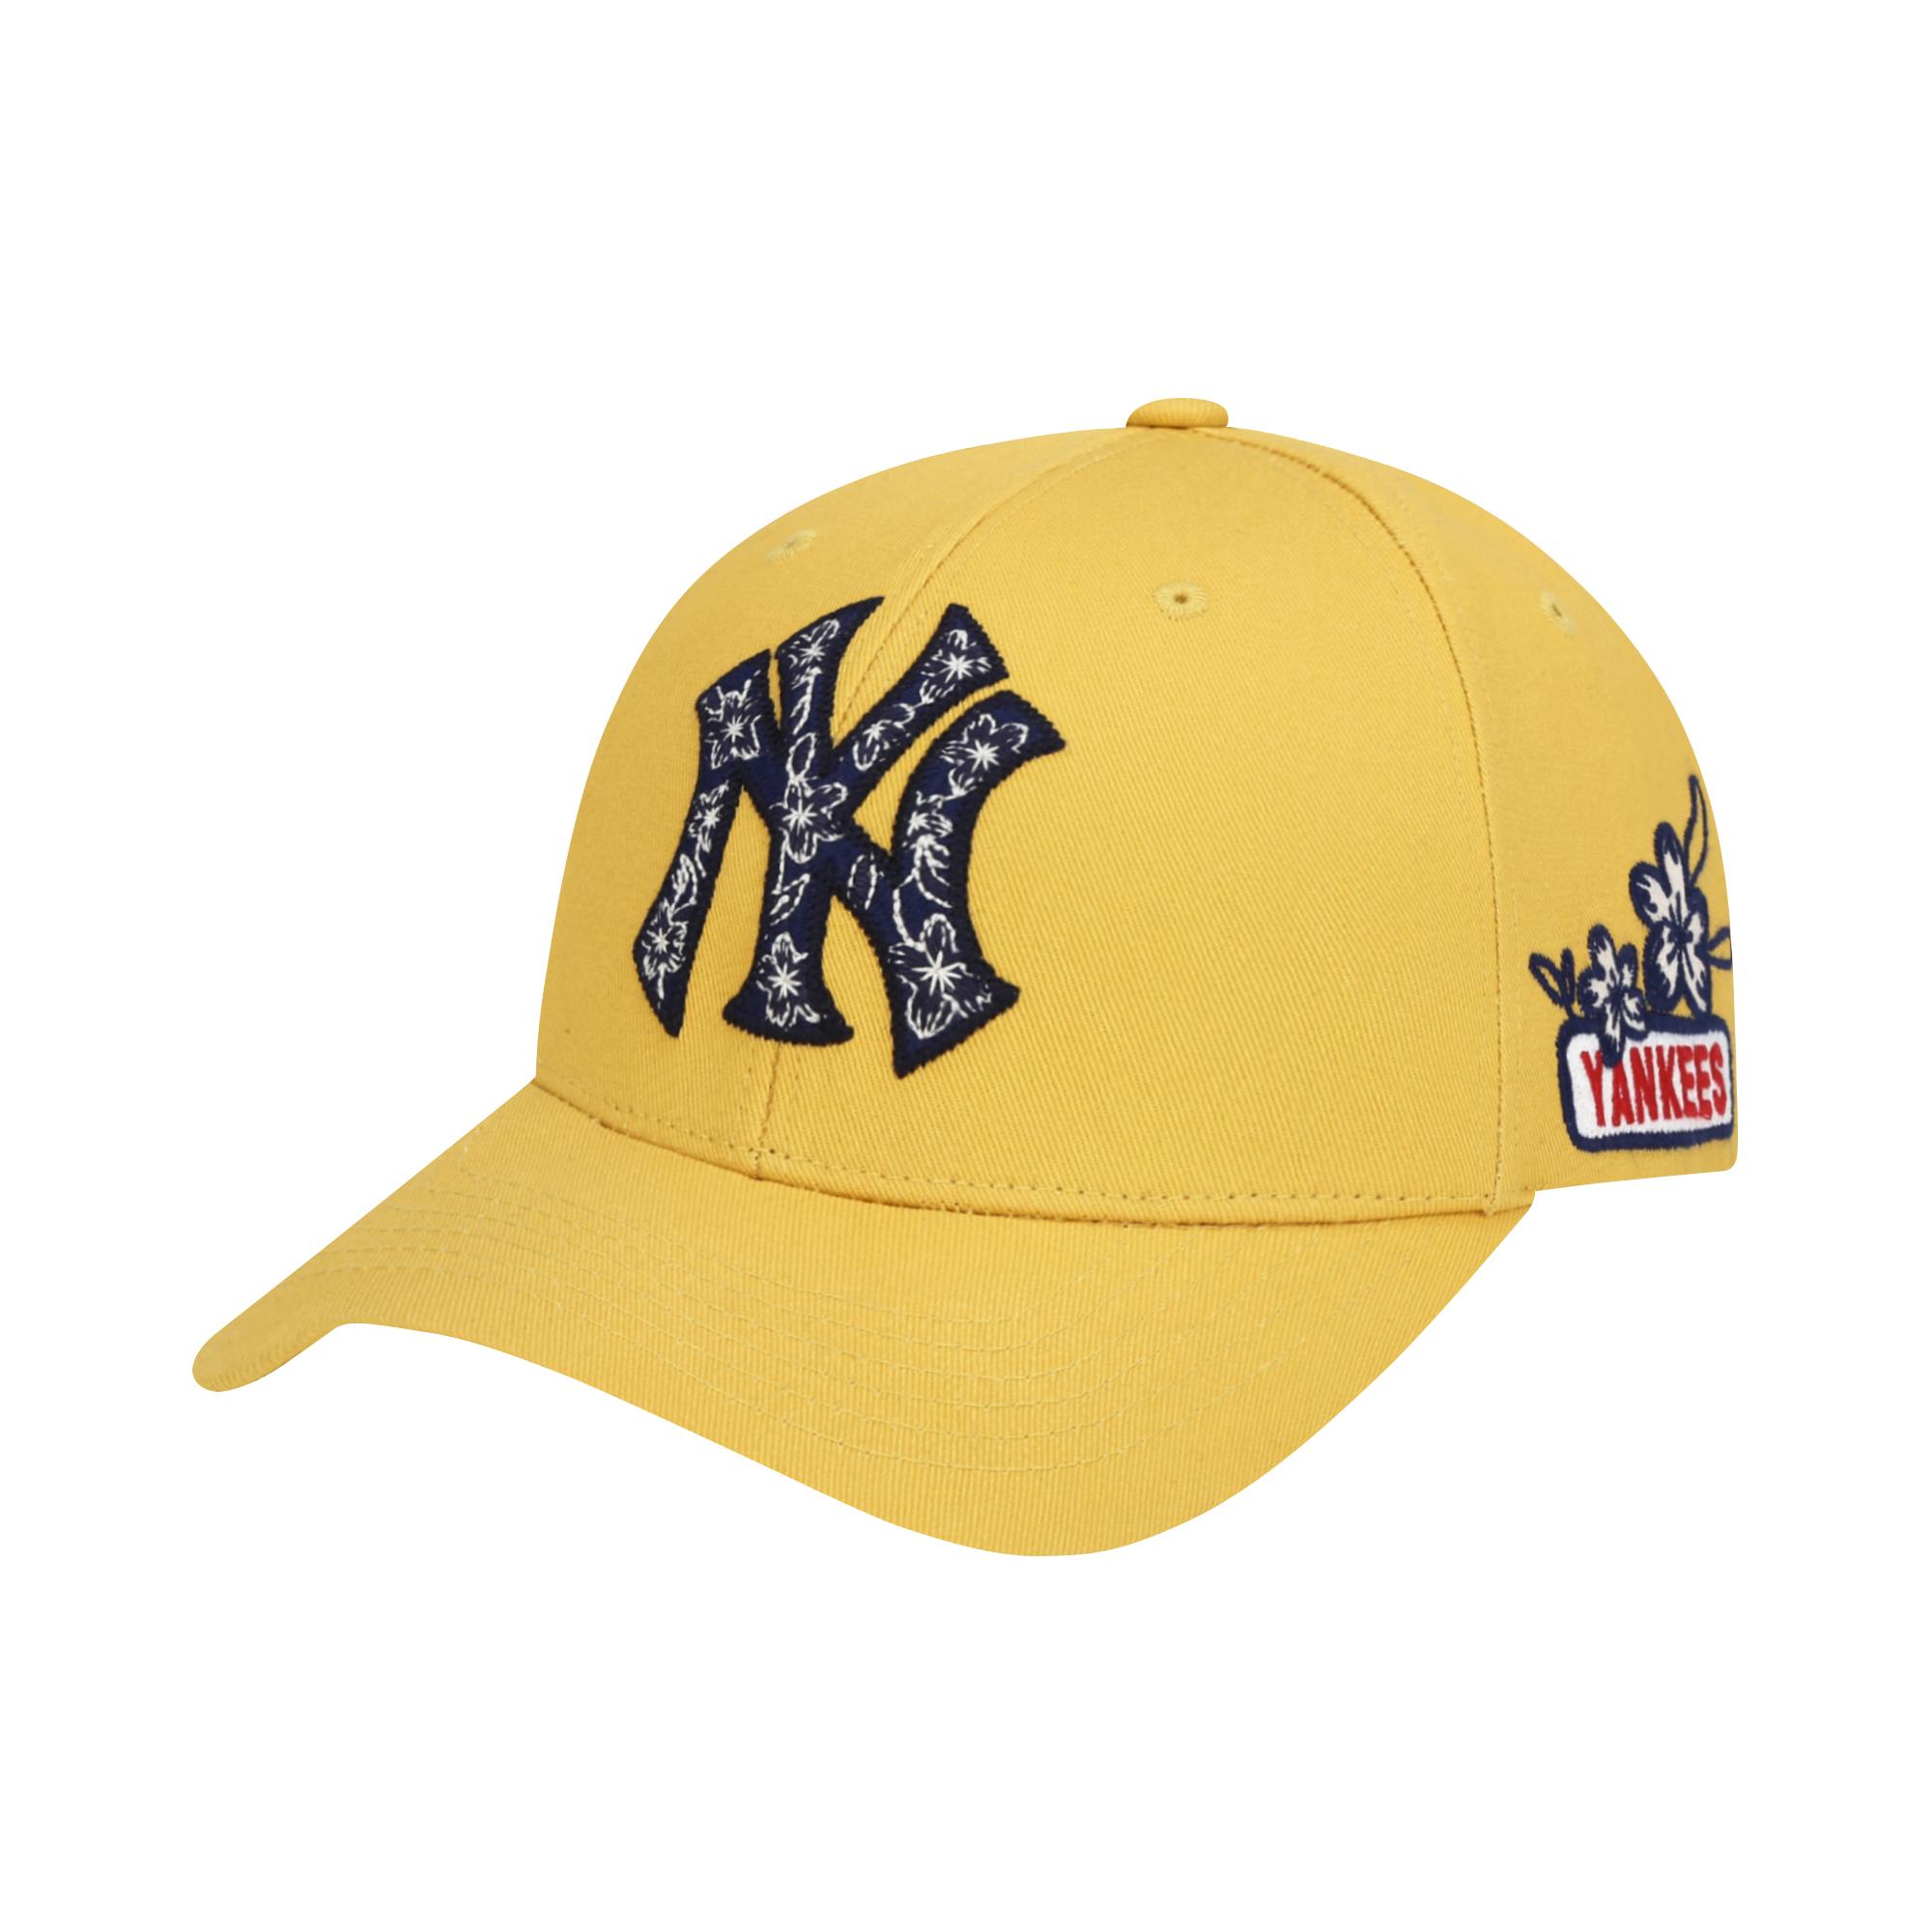 NEW YORK YANKEES JOUY LOGO ADJUSTABLE CAP